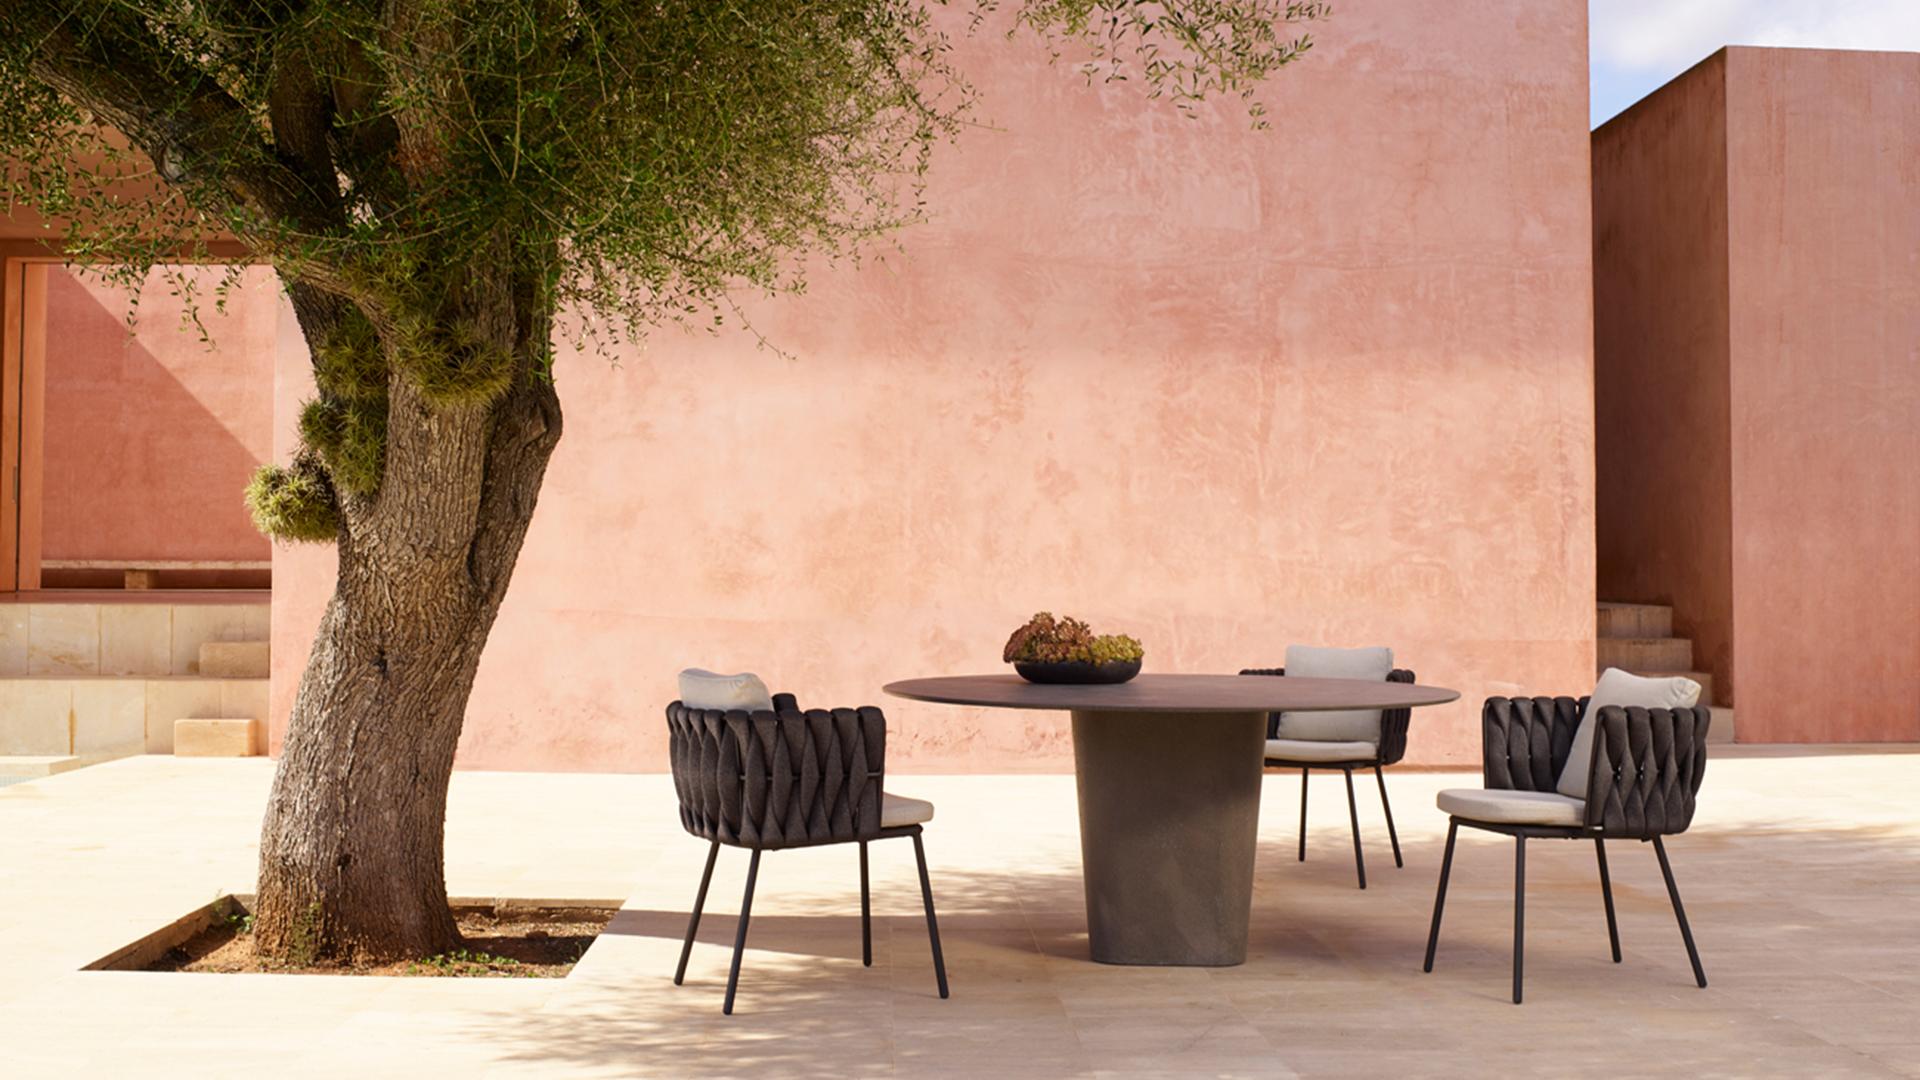 036418121dc5 Deloudis | Contemporary design stores in Greece & Cyprus